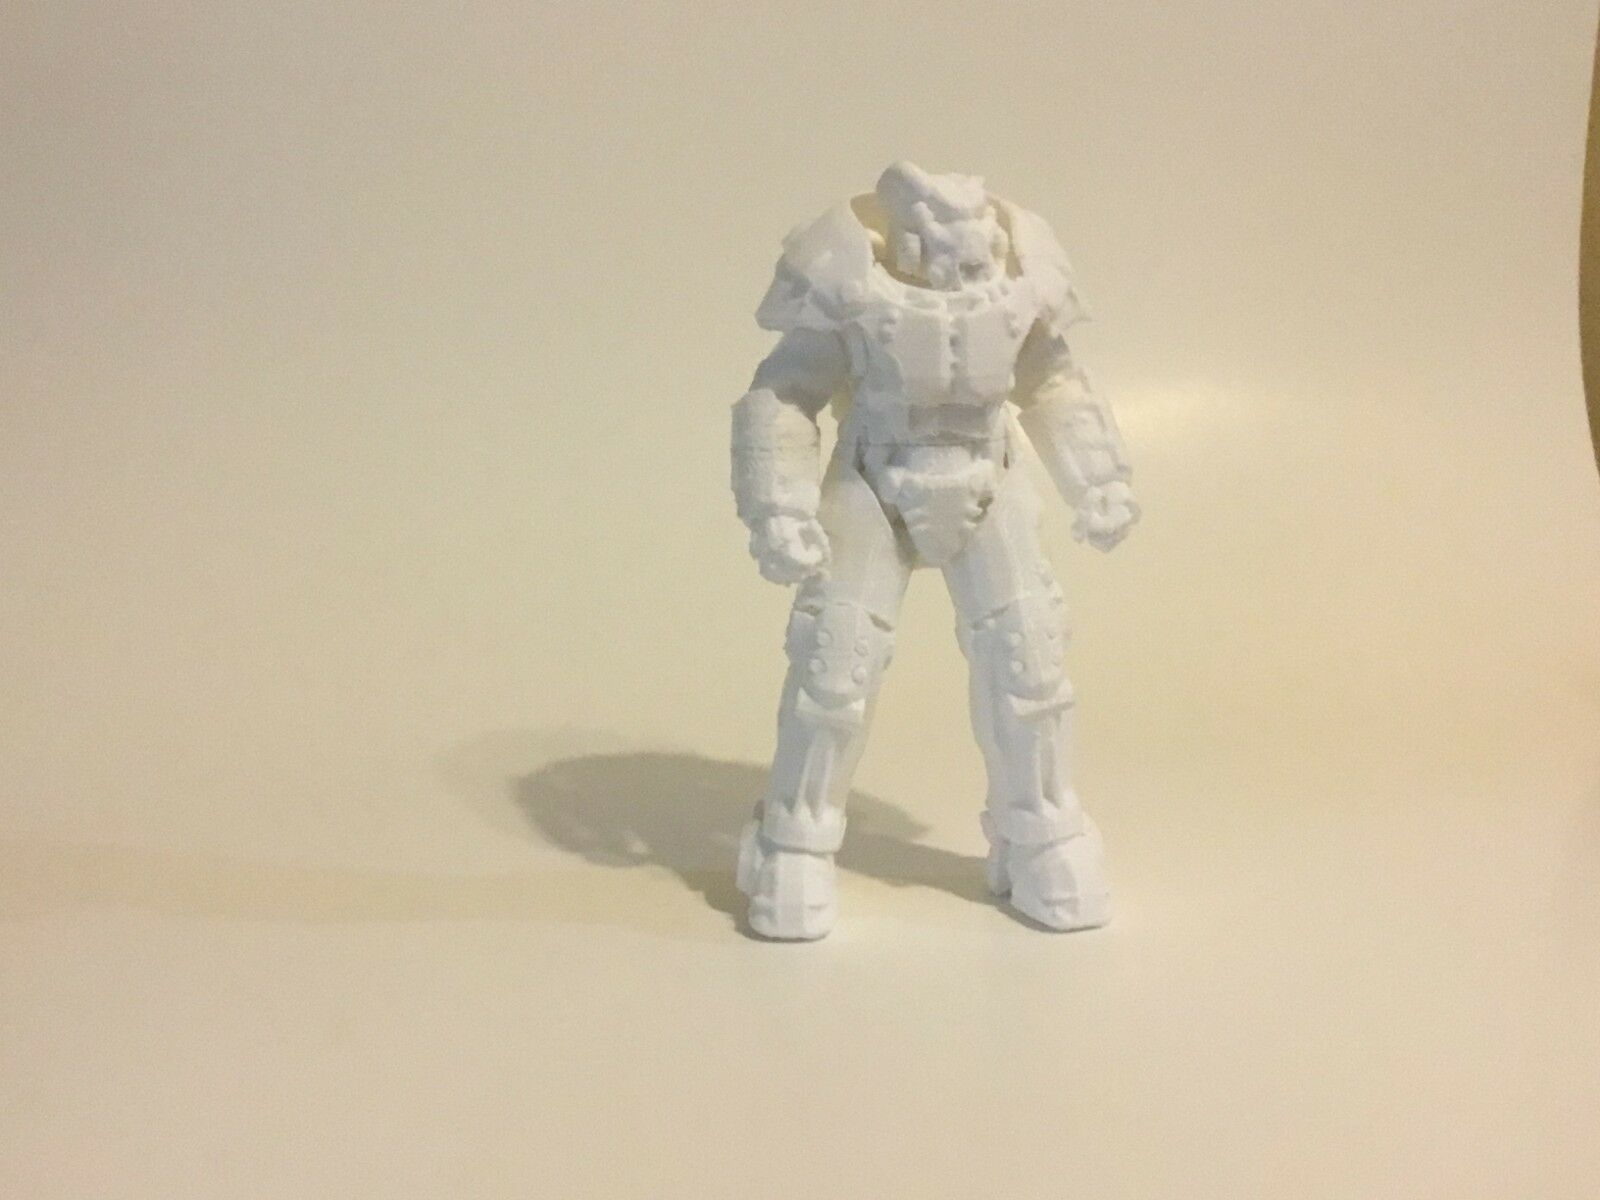 X-01 macht die statuette, 9 zentimeter,  3d - gedruckte fallout, nicht gemalt.